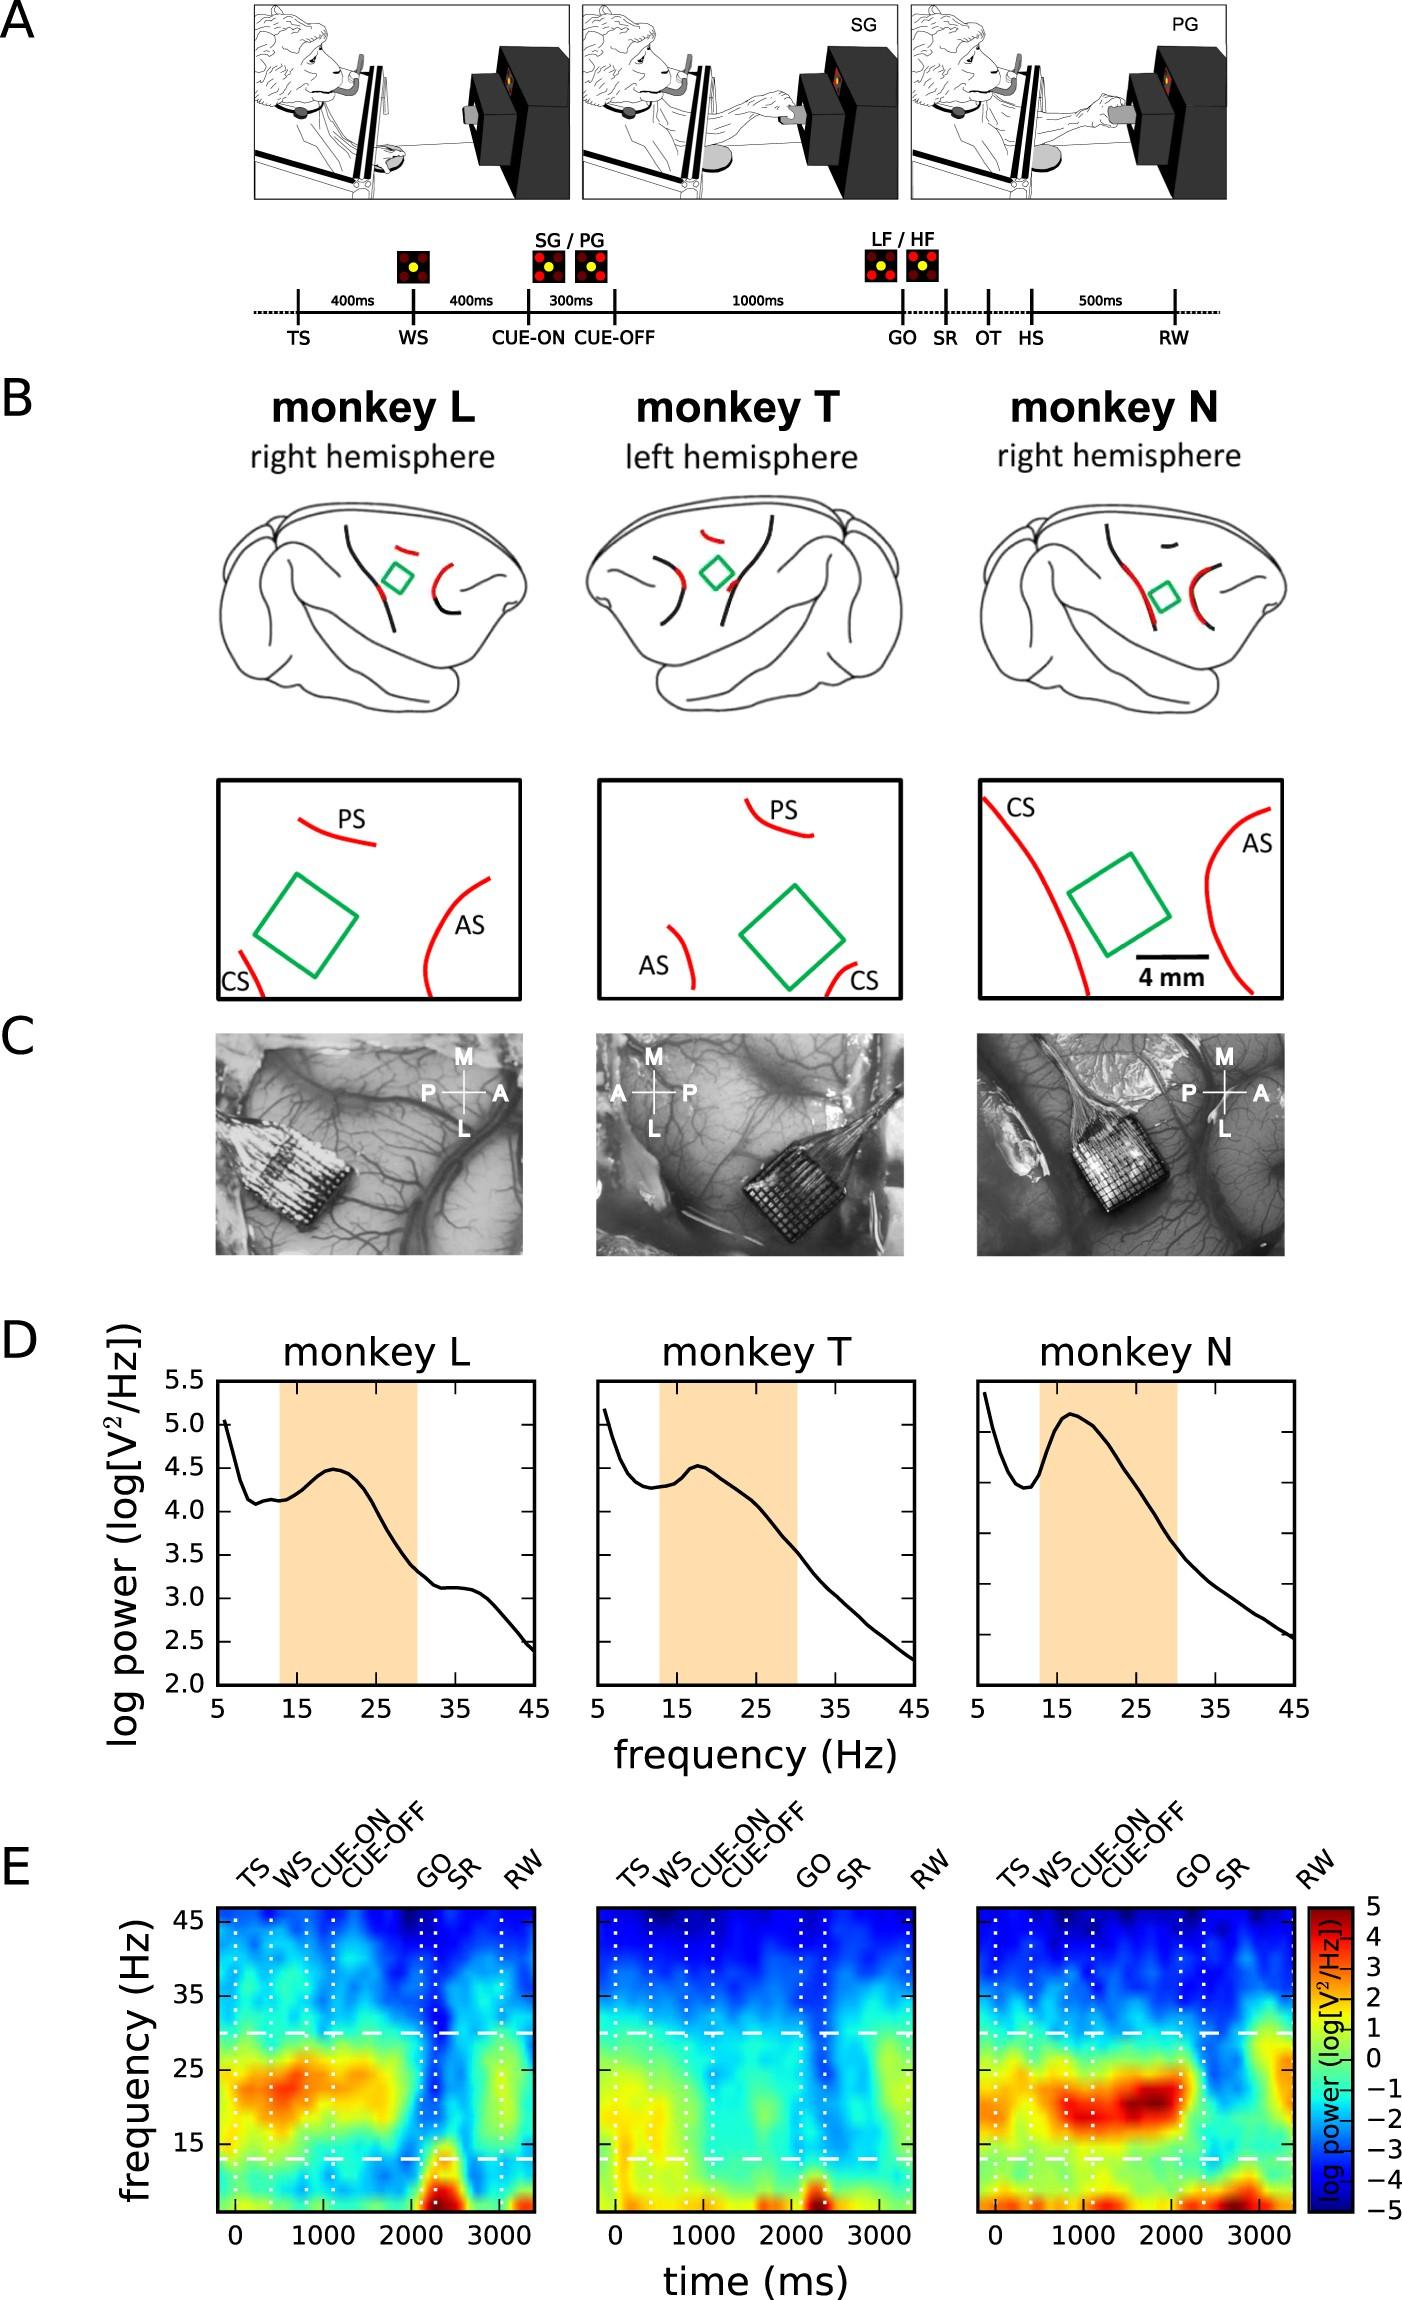 LFP beta amplitude is linked to mesoscopic spatio-temporal